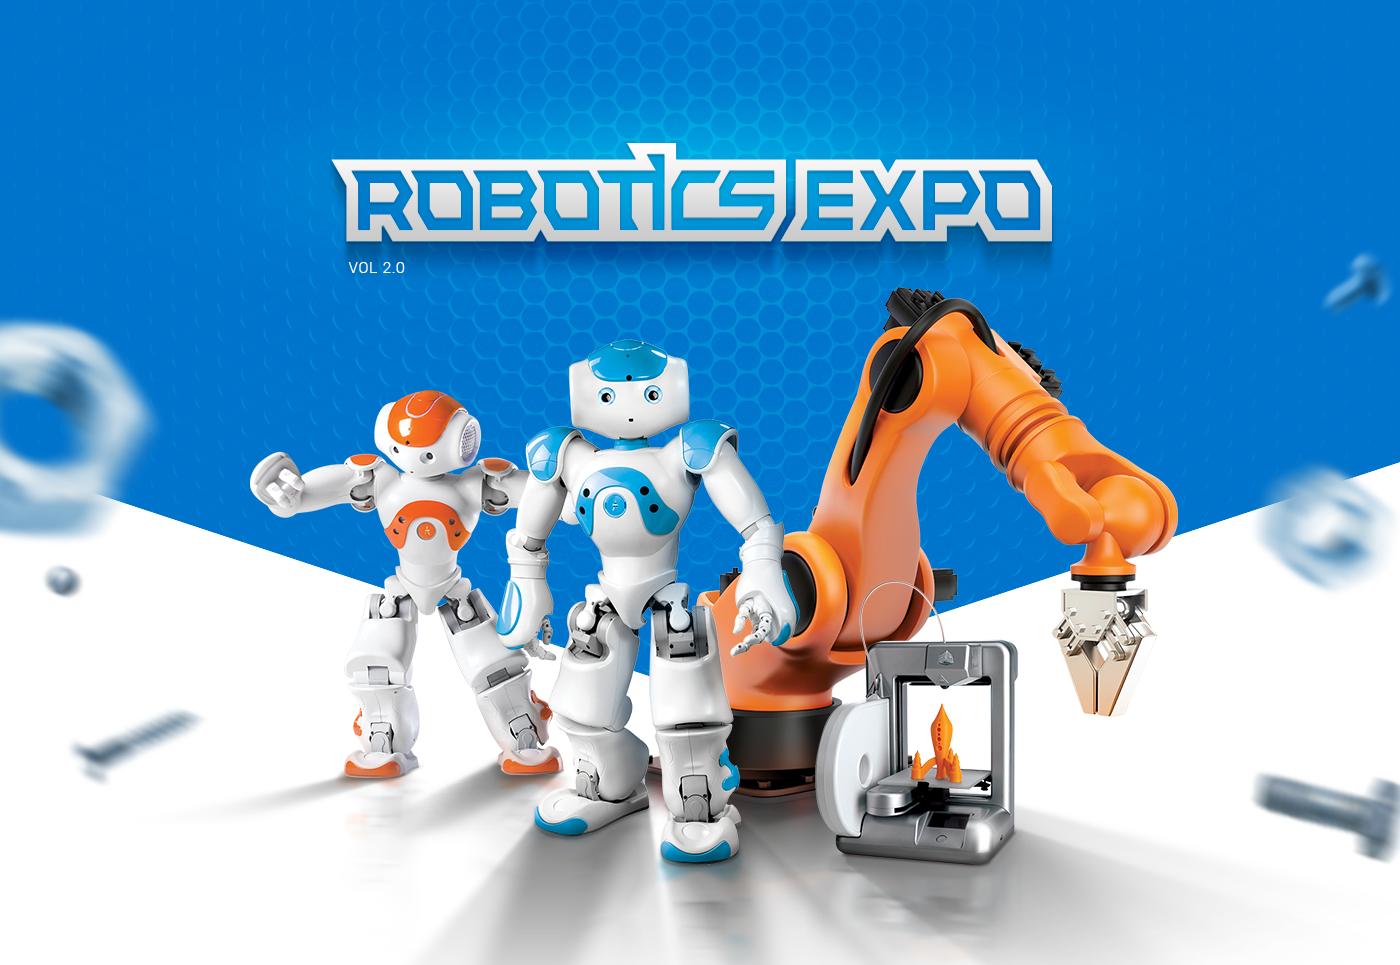 постер по робототехнике петербурге